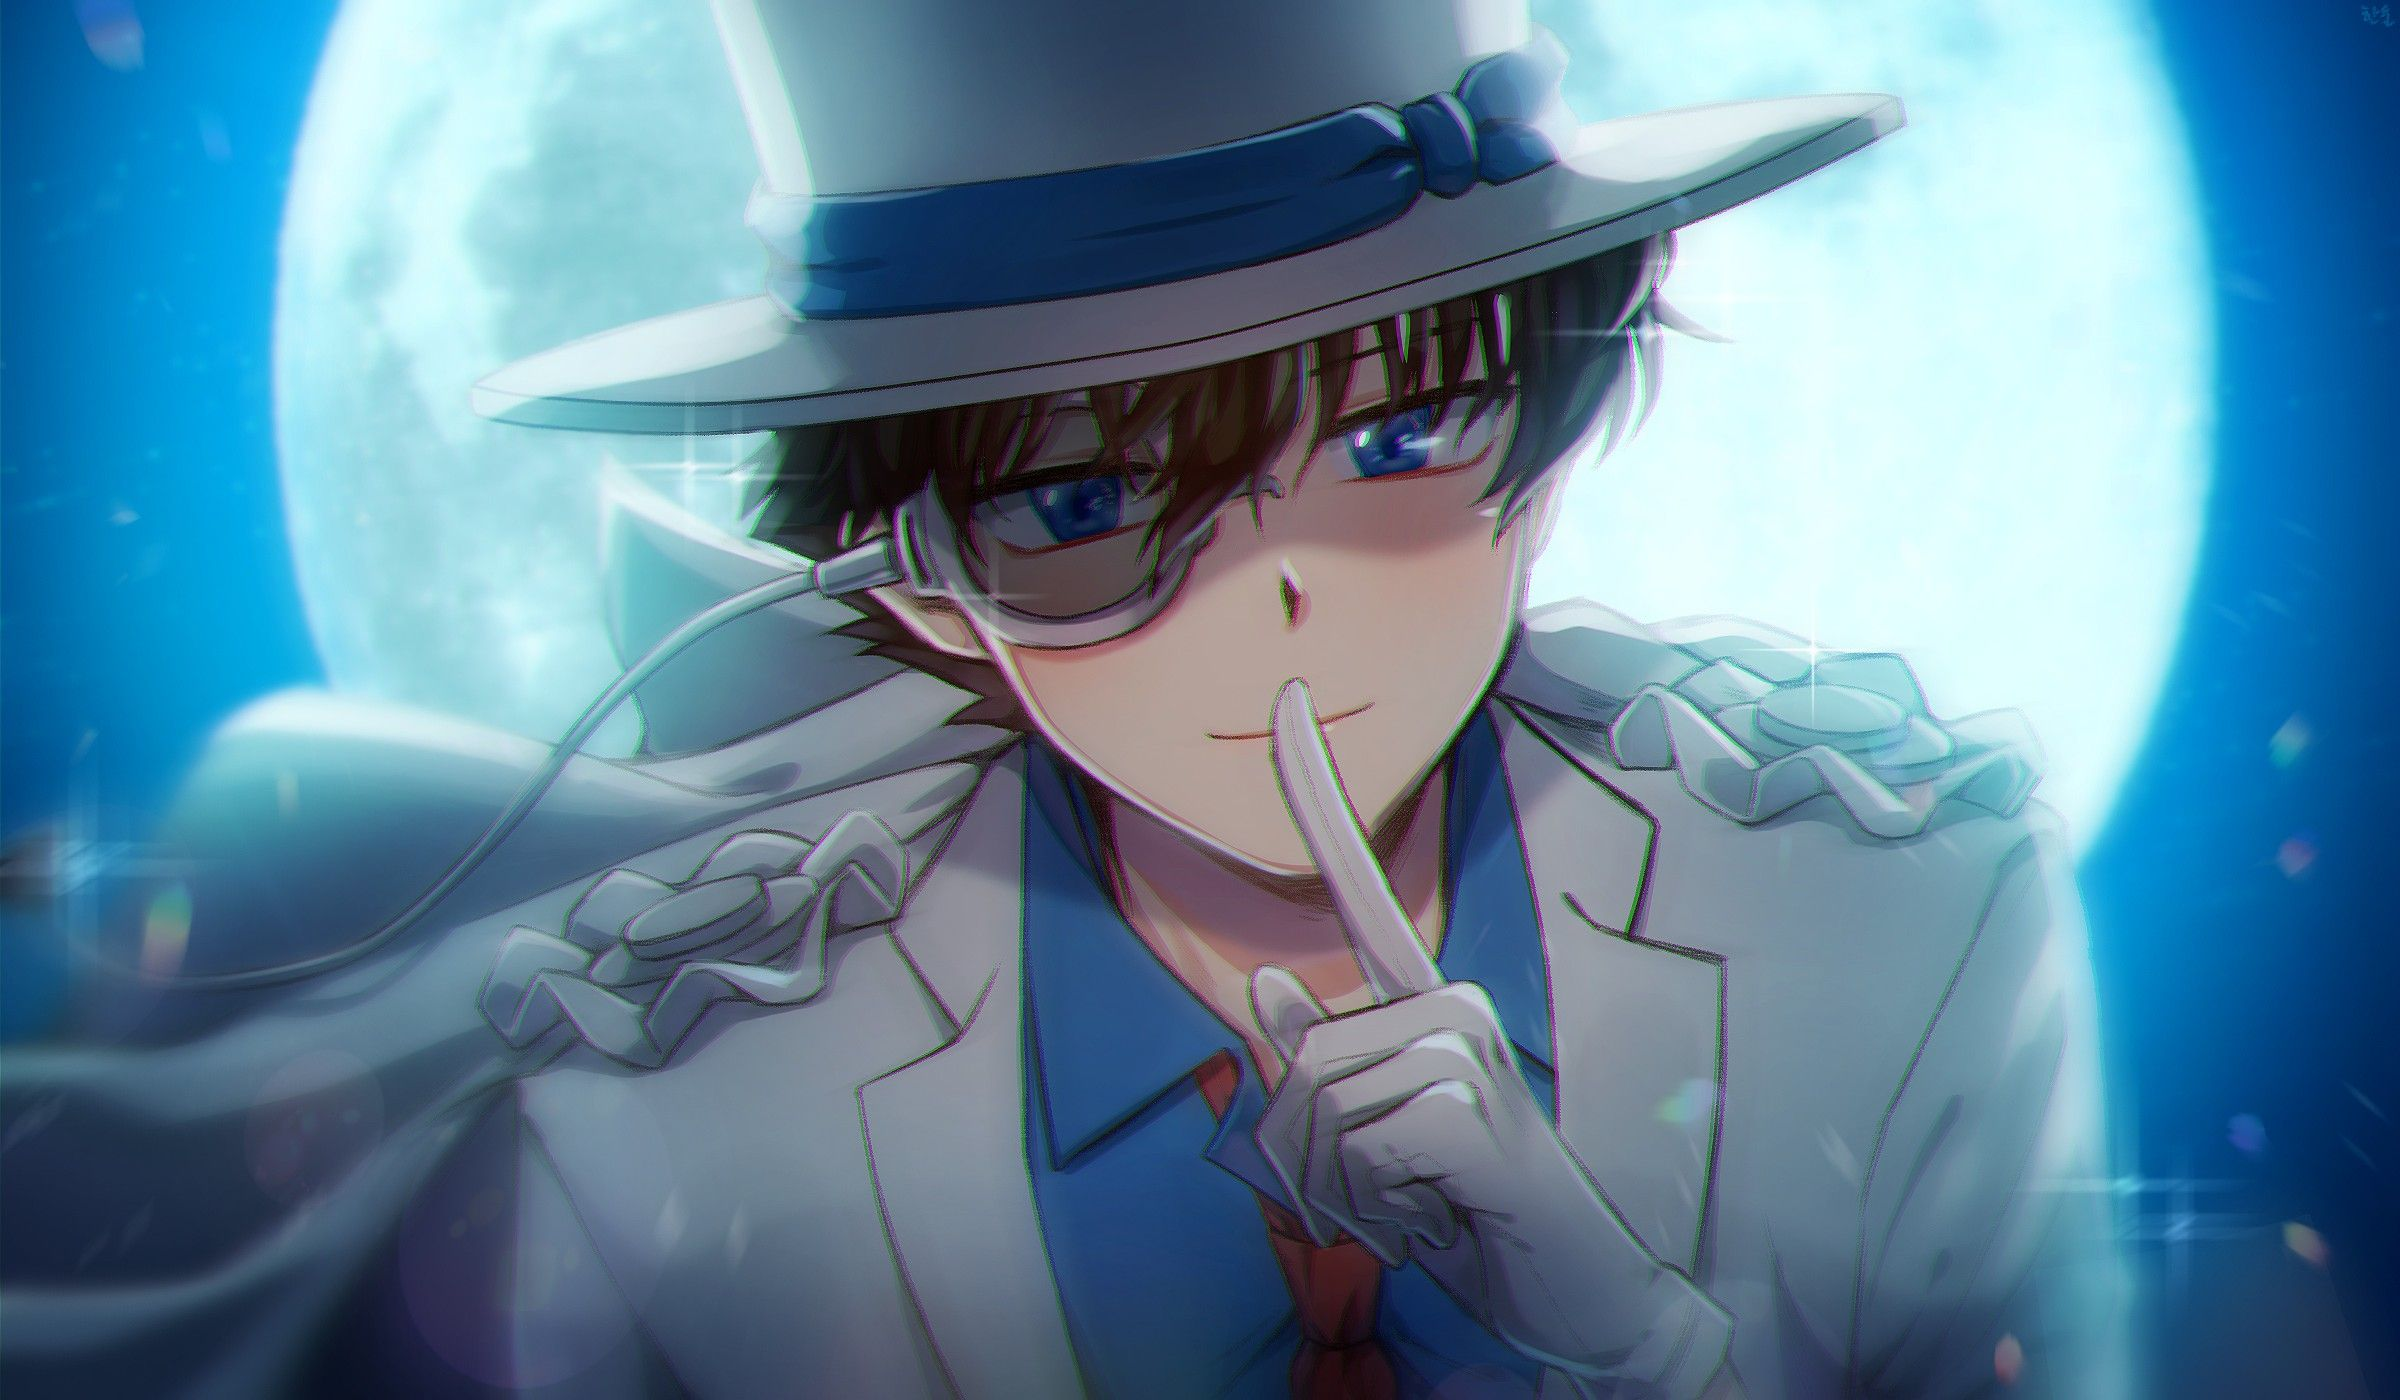 Kaito Kid X Detective Reader - KIDAUSTA